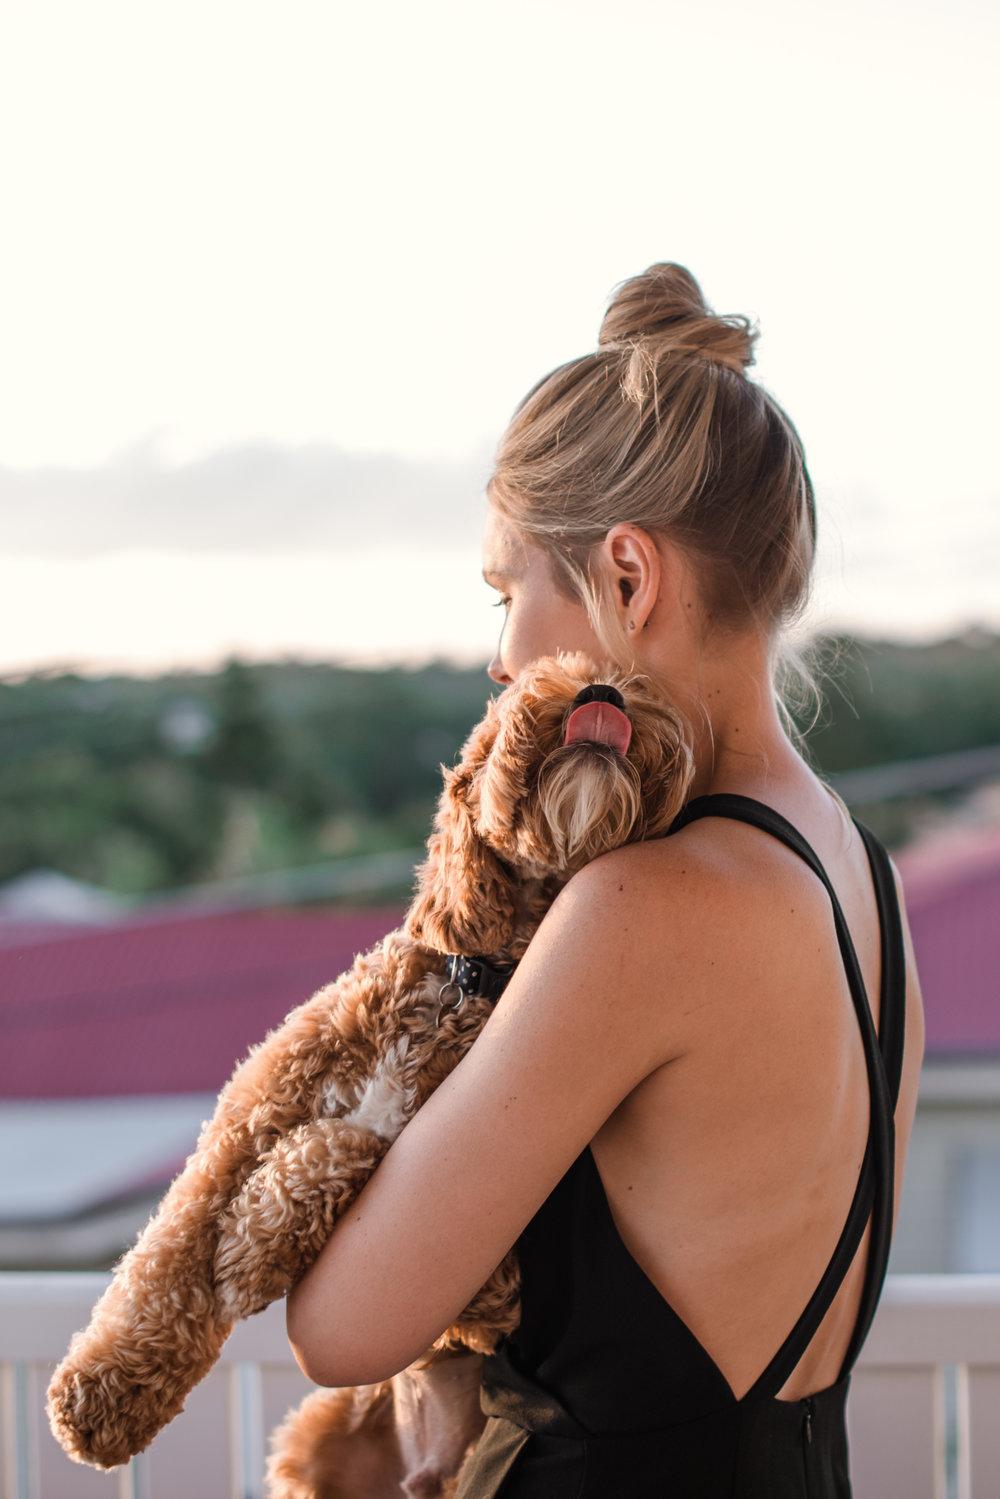 LOVELENSCAPES PHOTOGRAPHY • VISUAL POETRY • SOPHIA & VIJAY'S ENGAGEMENT • 8.jpg